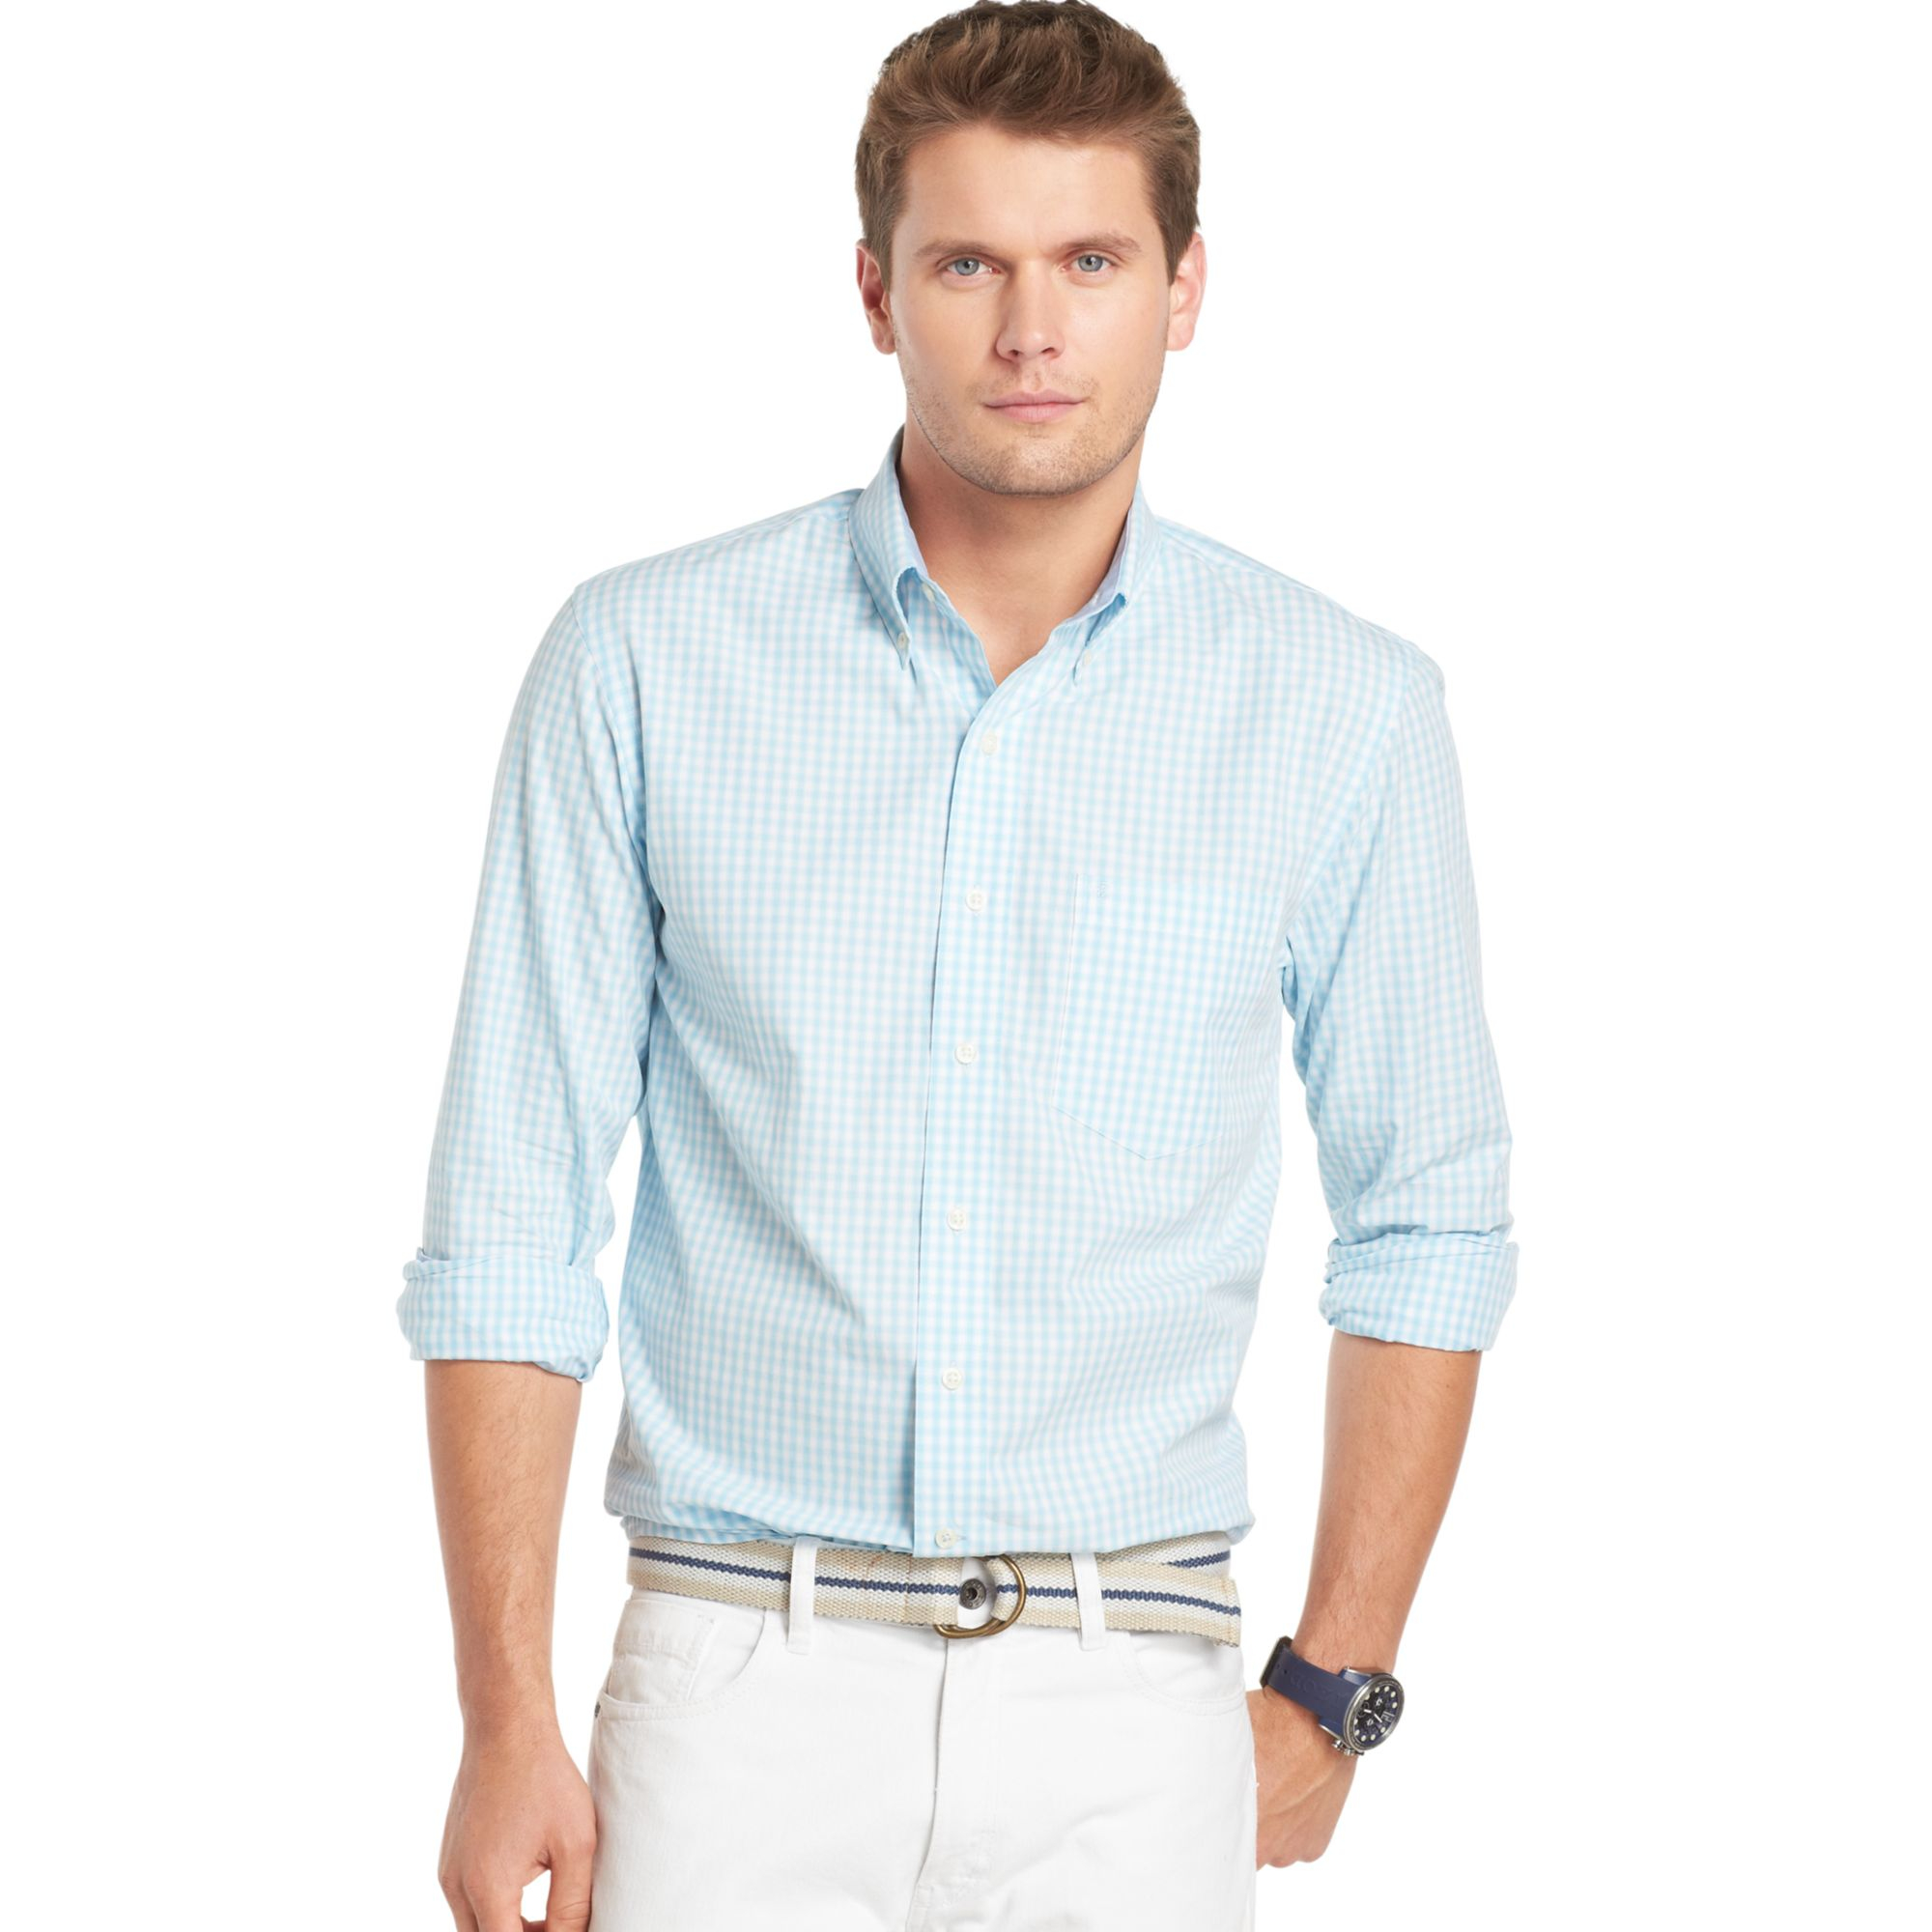 Izod big and tall essential shadow gingham shirt in blue for Izod big and tall shirts